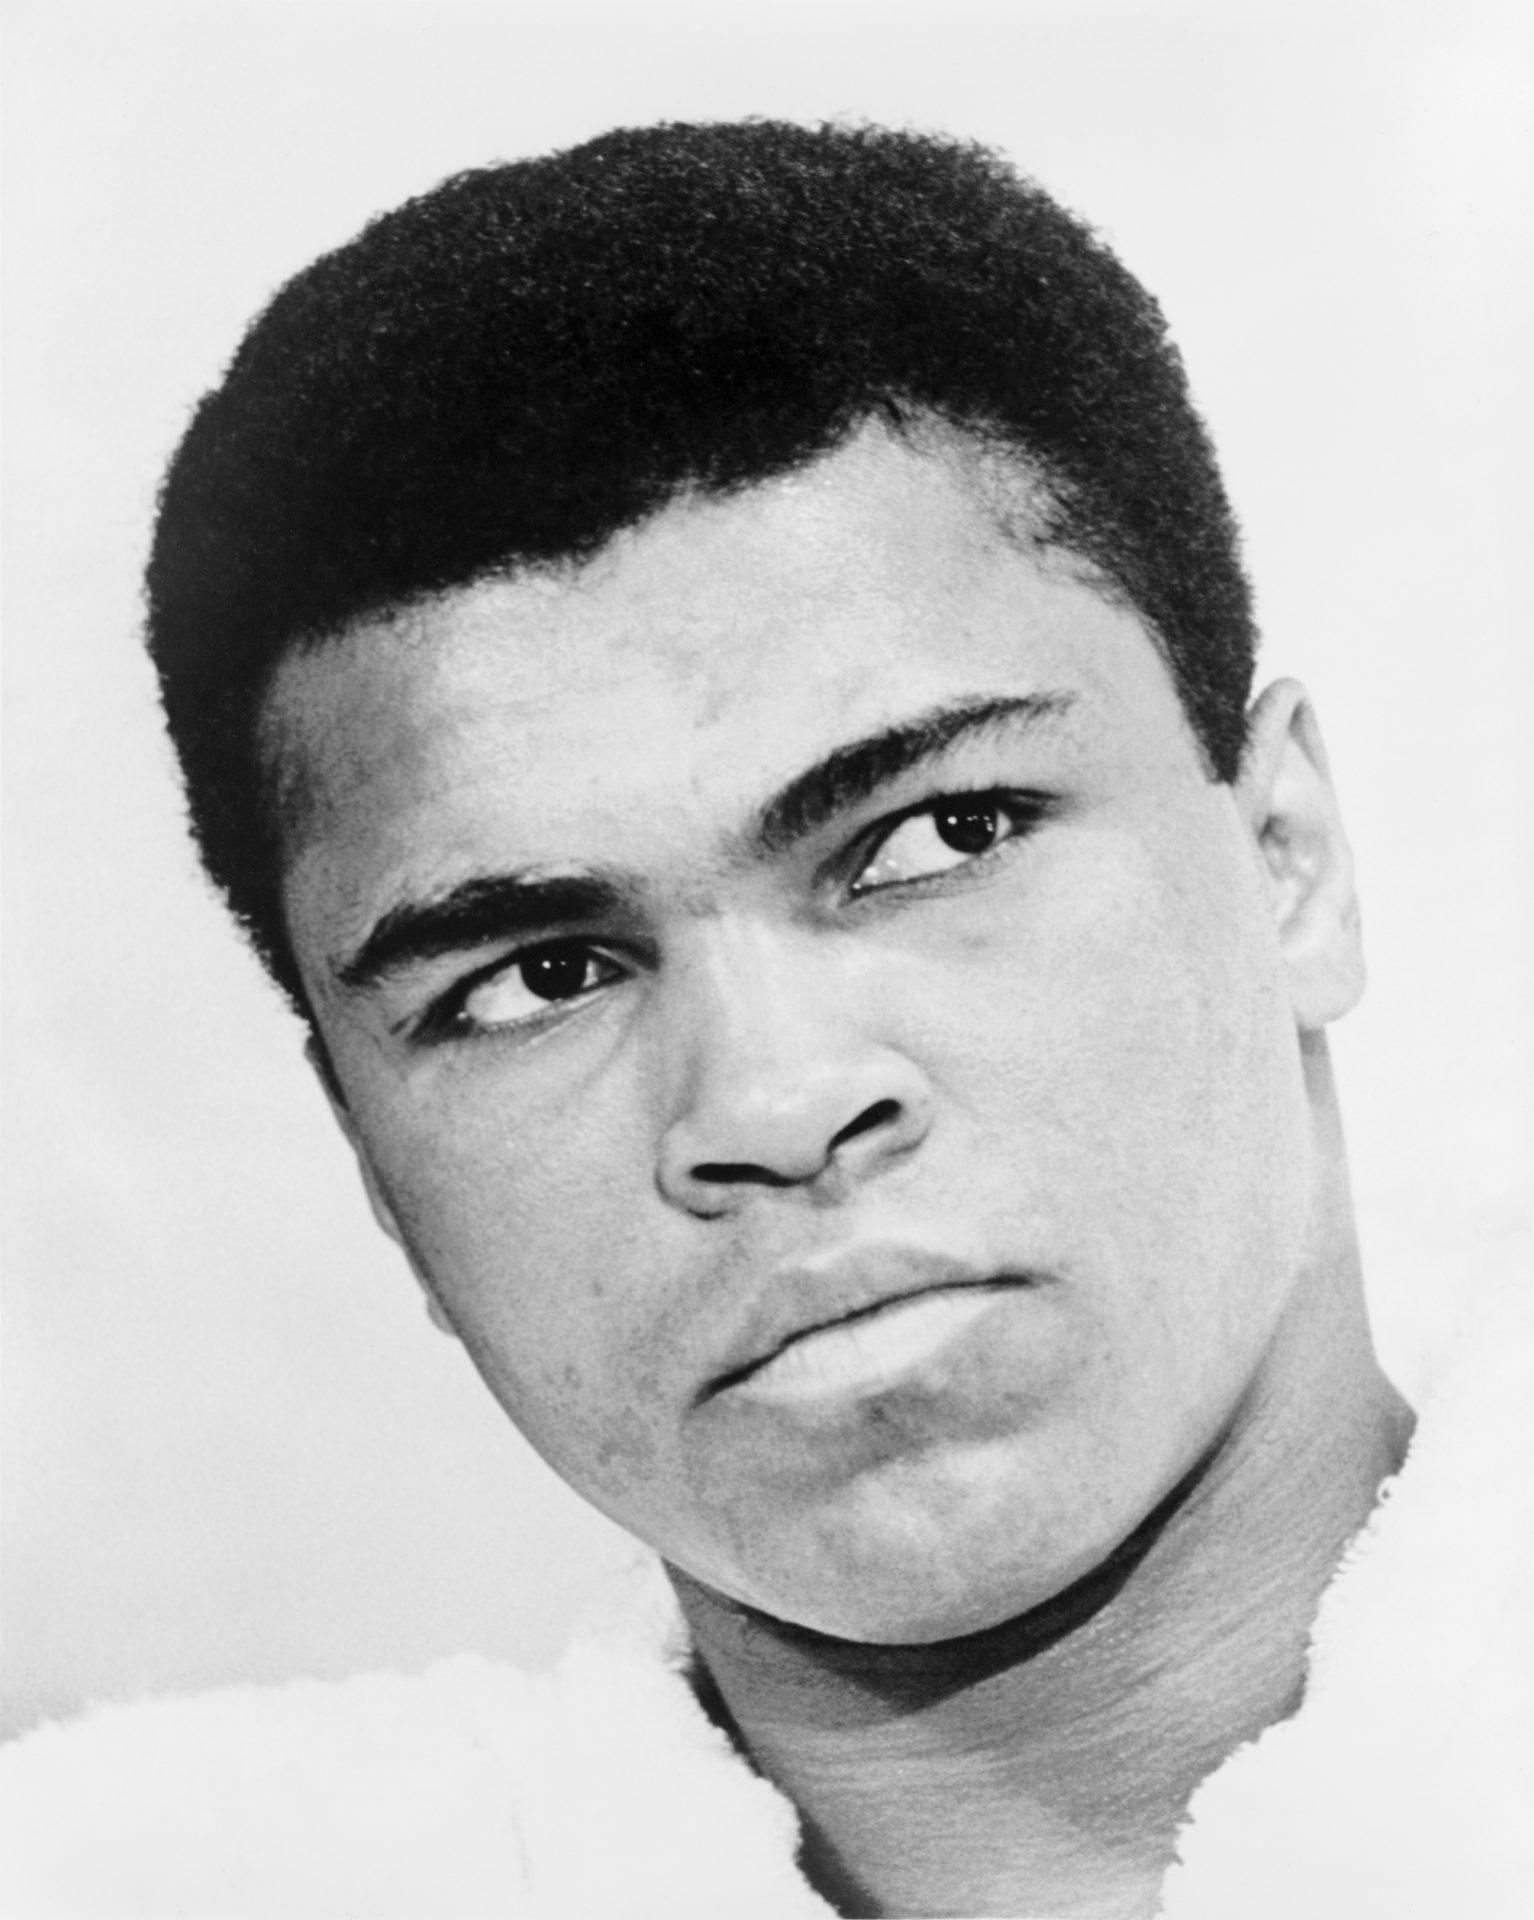 Muhammad Ali in 1967/Ira Rosenberg